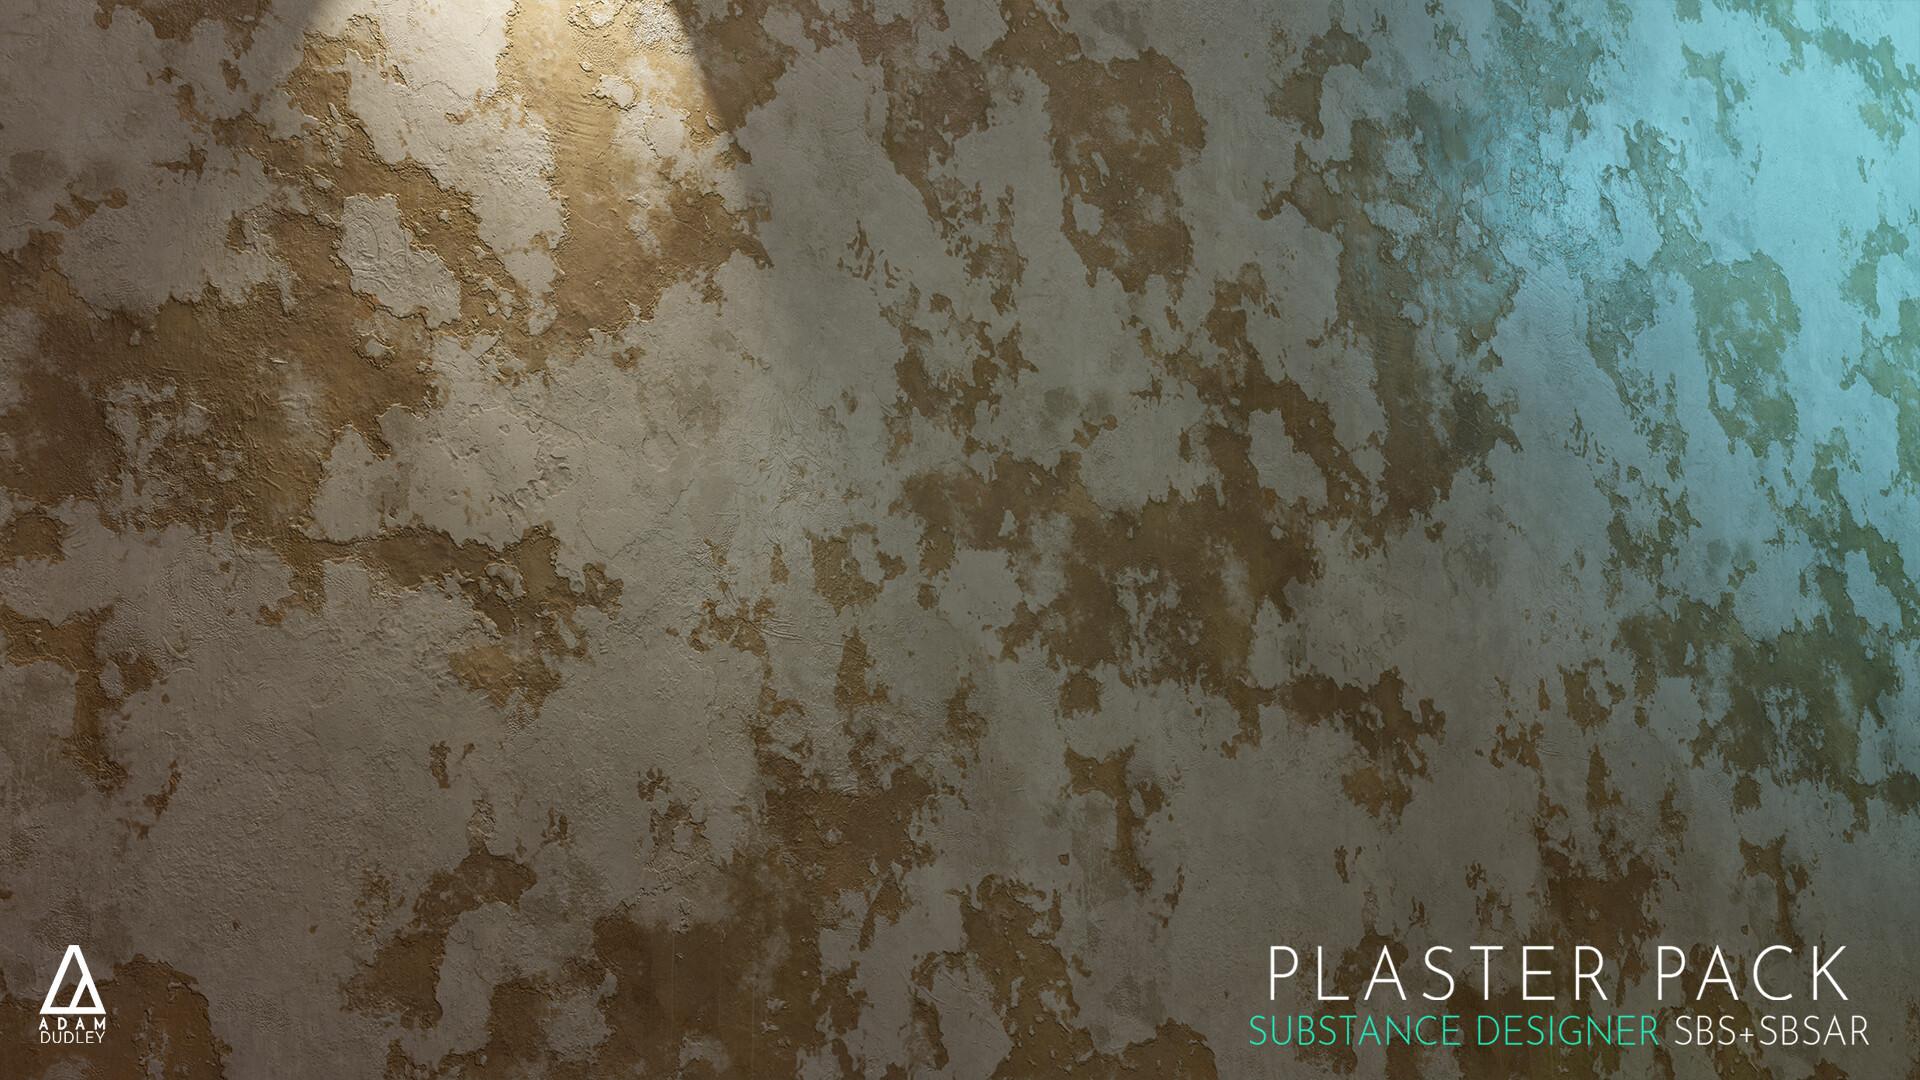 Adam dudley x plasterpack 03